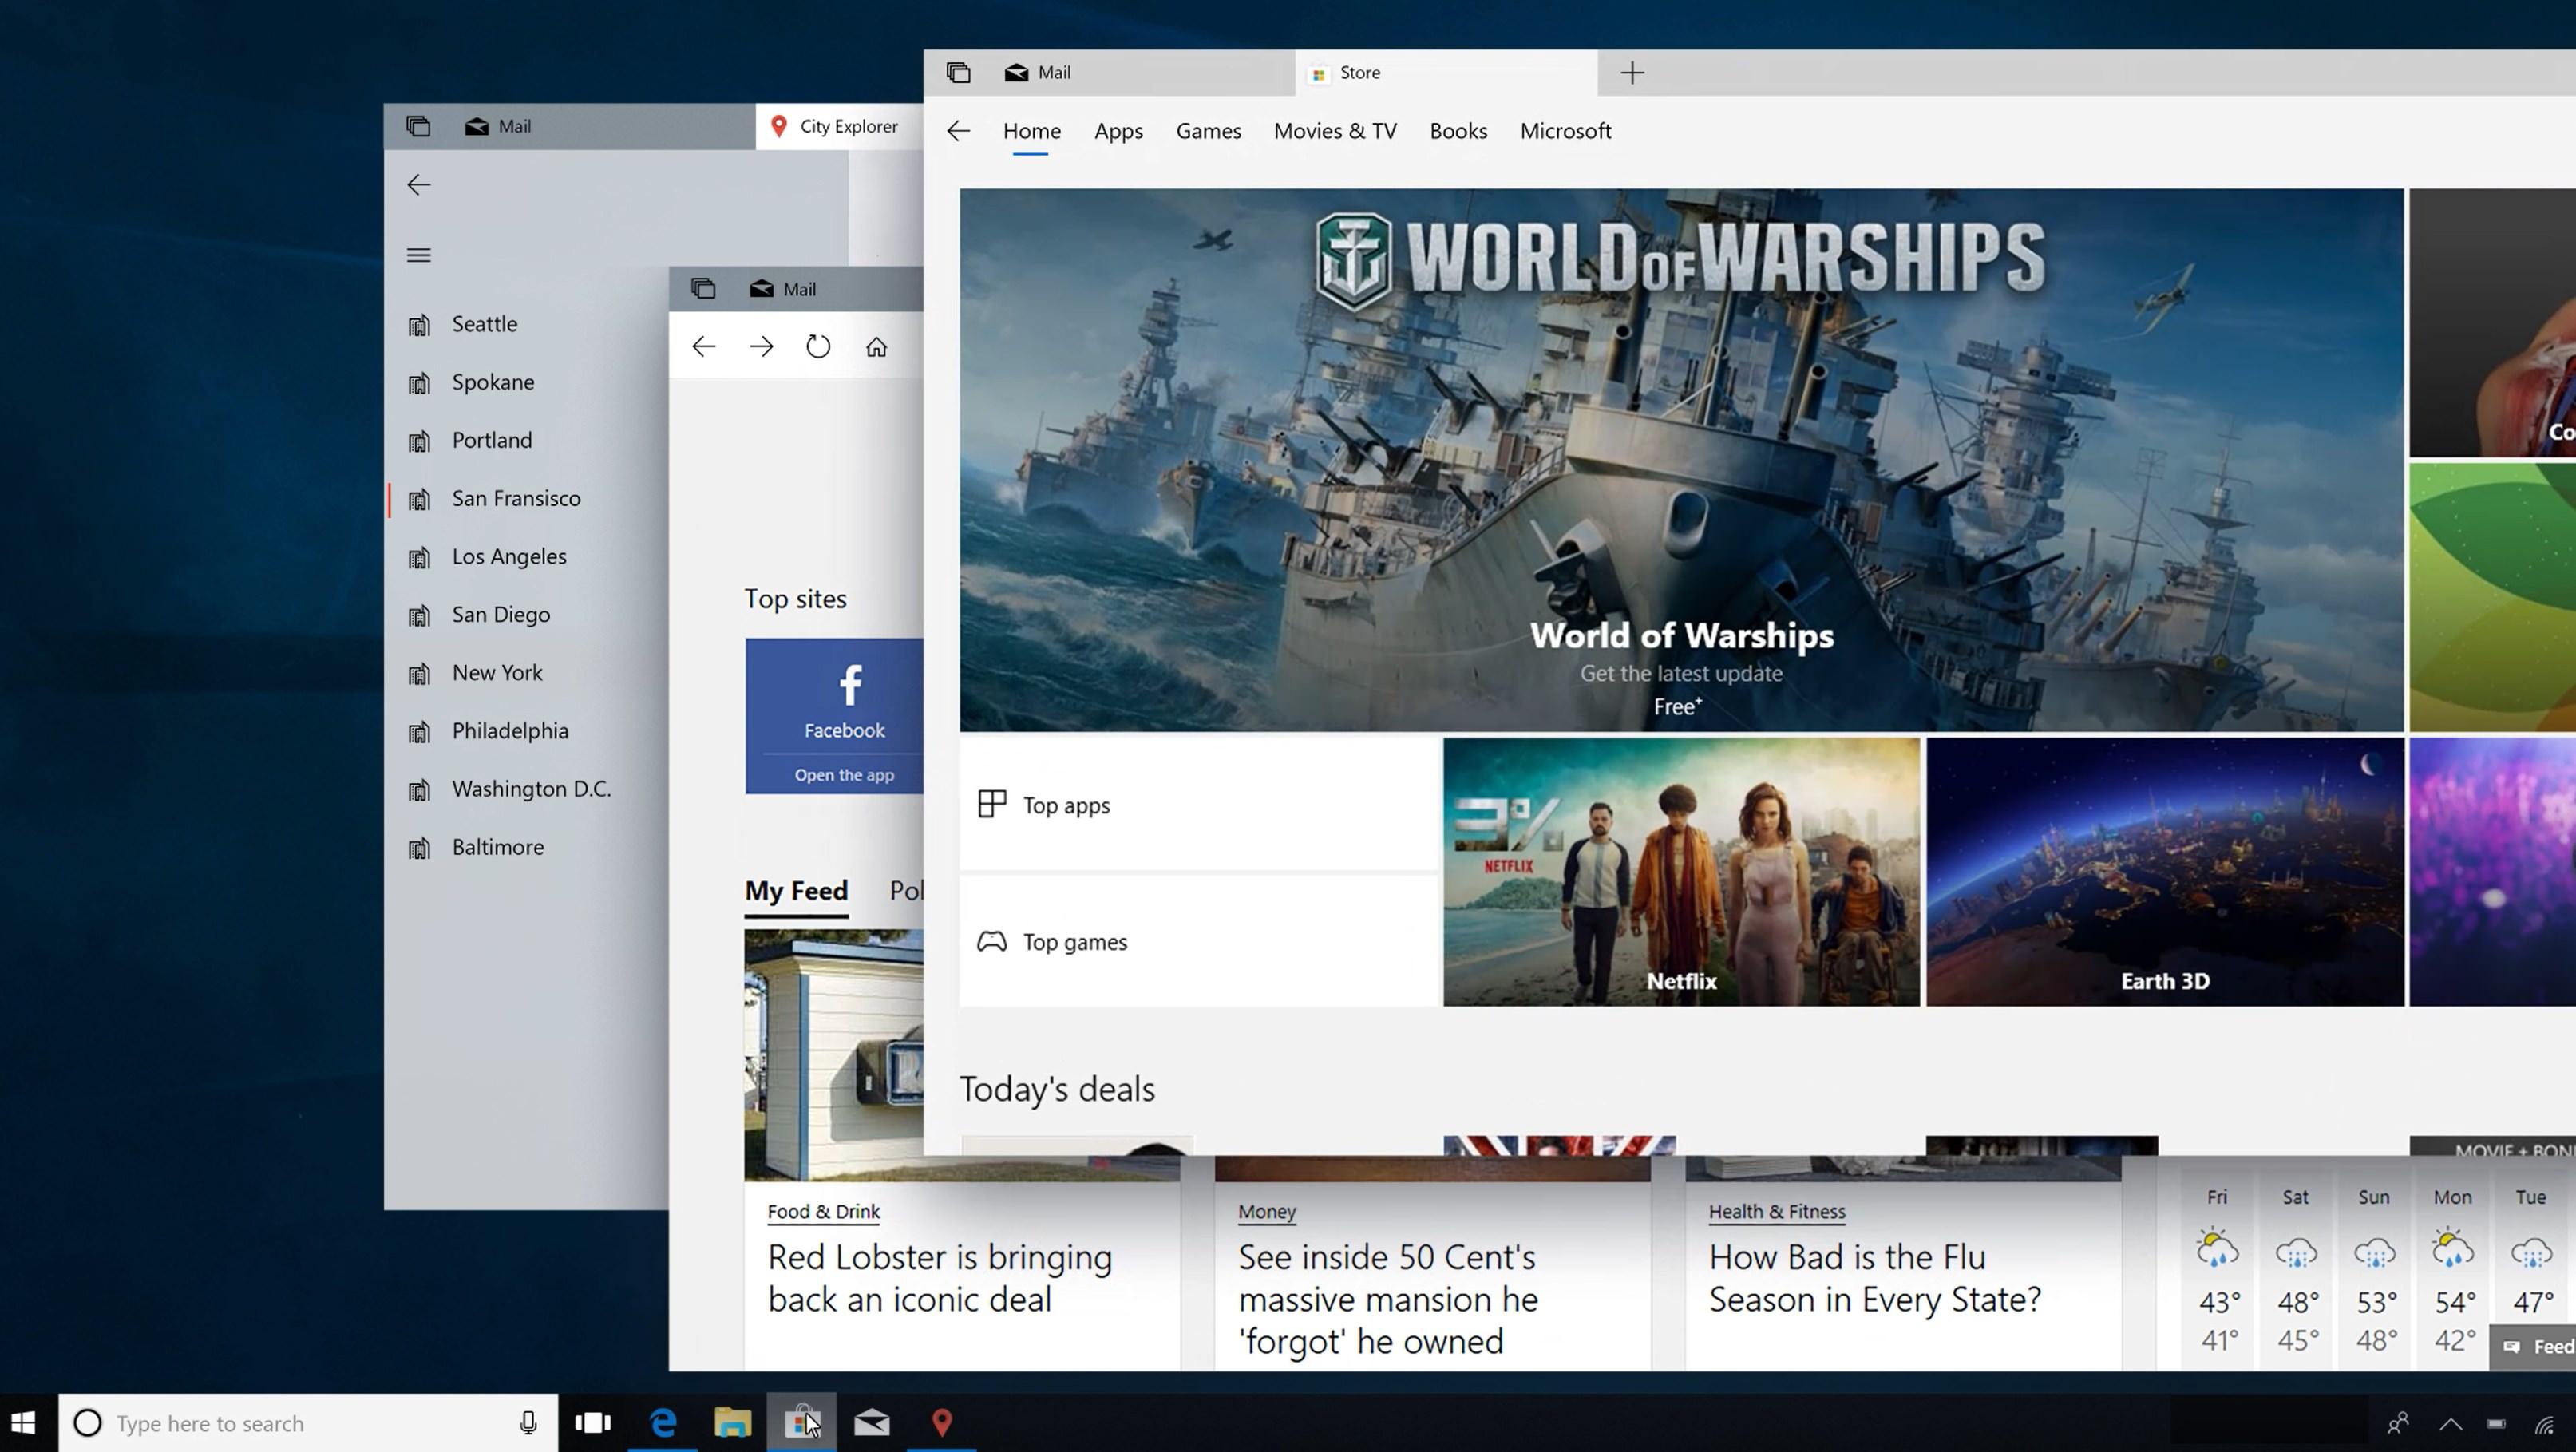 Windows 10 NOUL DESIGN Prezentat Microsoft 4